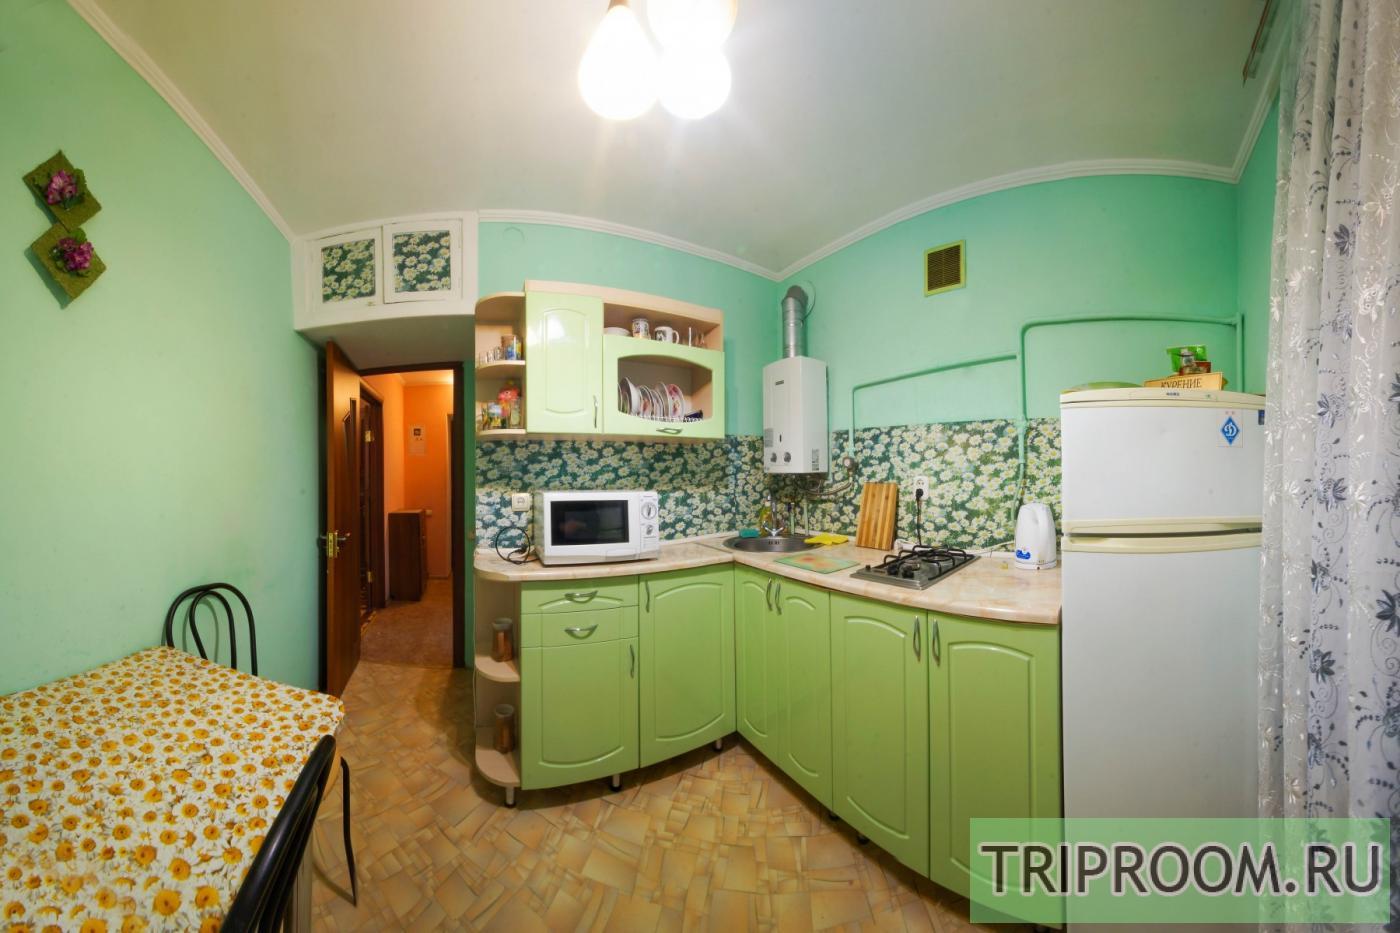 1-комнатная квартира посуточно (вариант № 29731), ул. Кирова улица, фото № 3